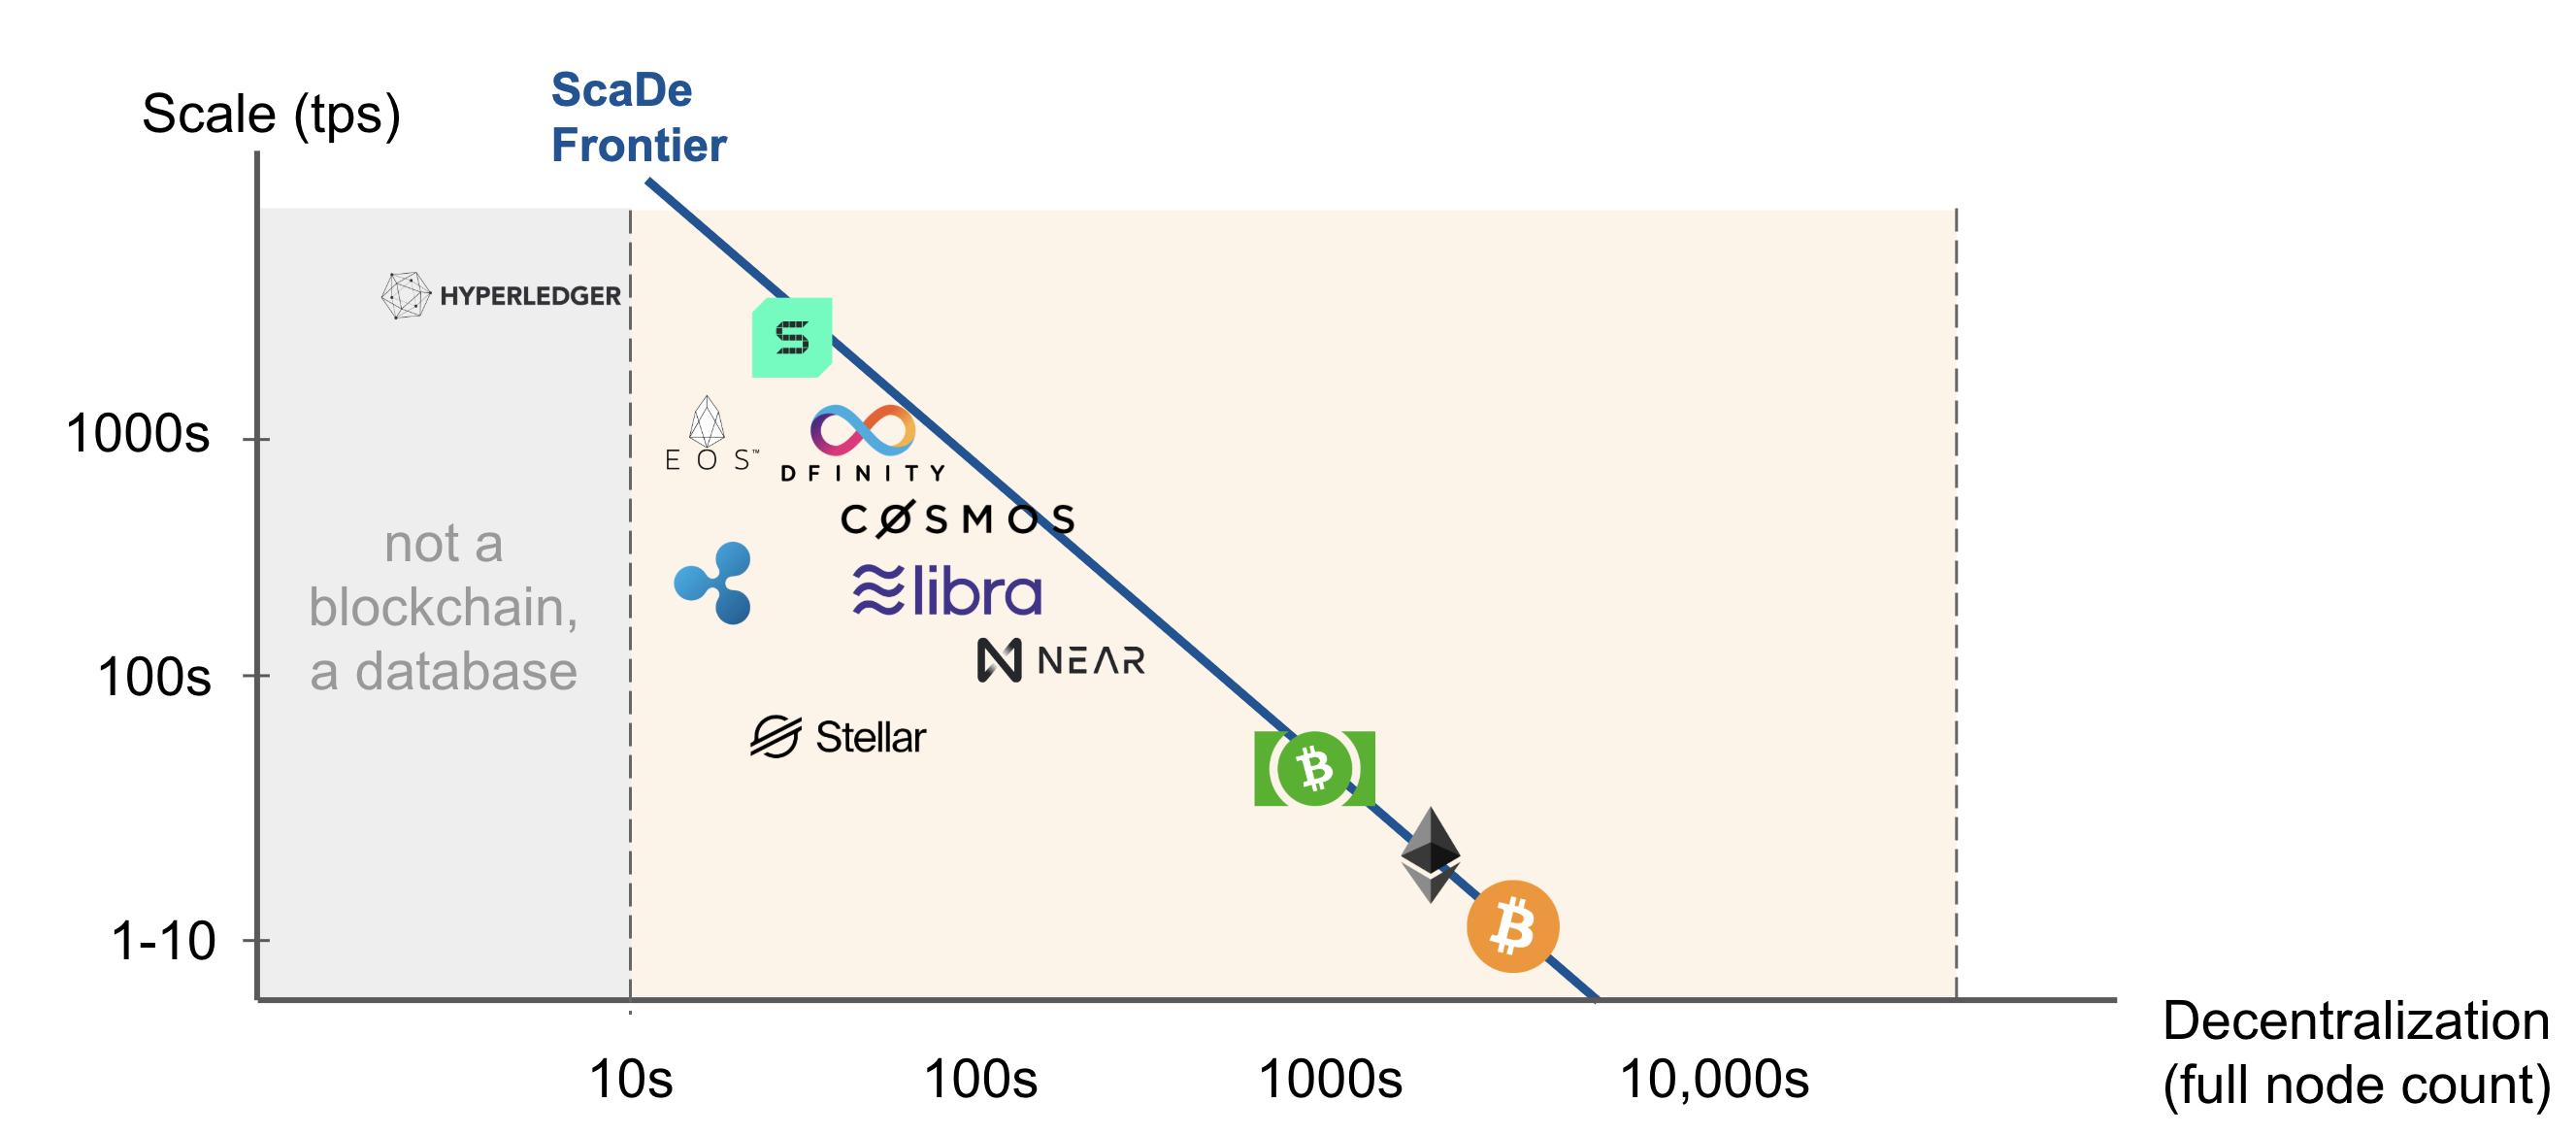 ScaDe Chart